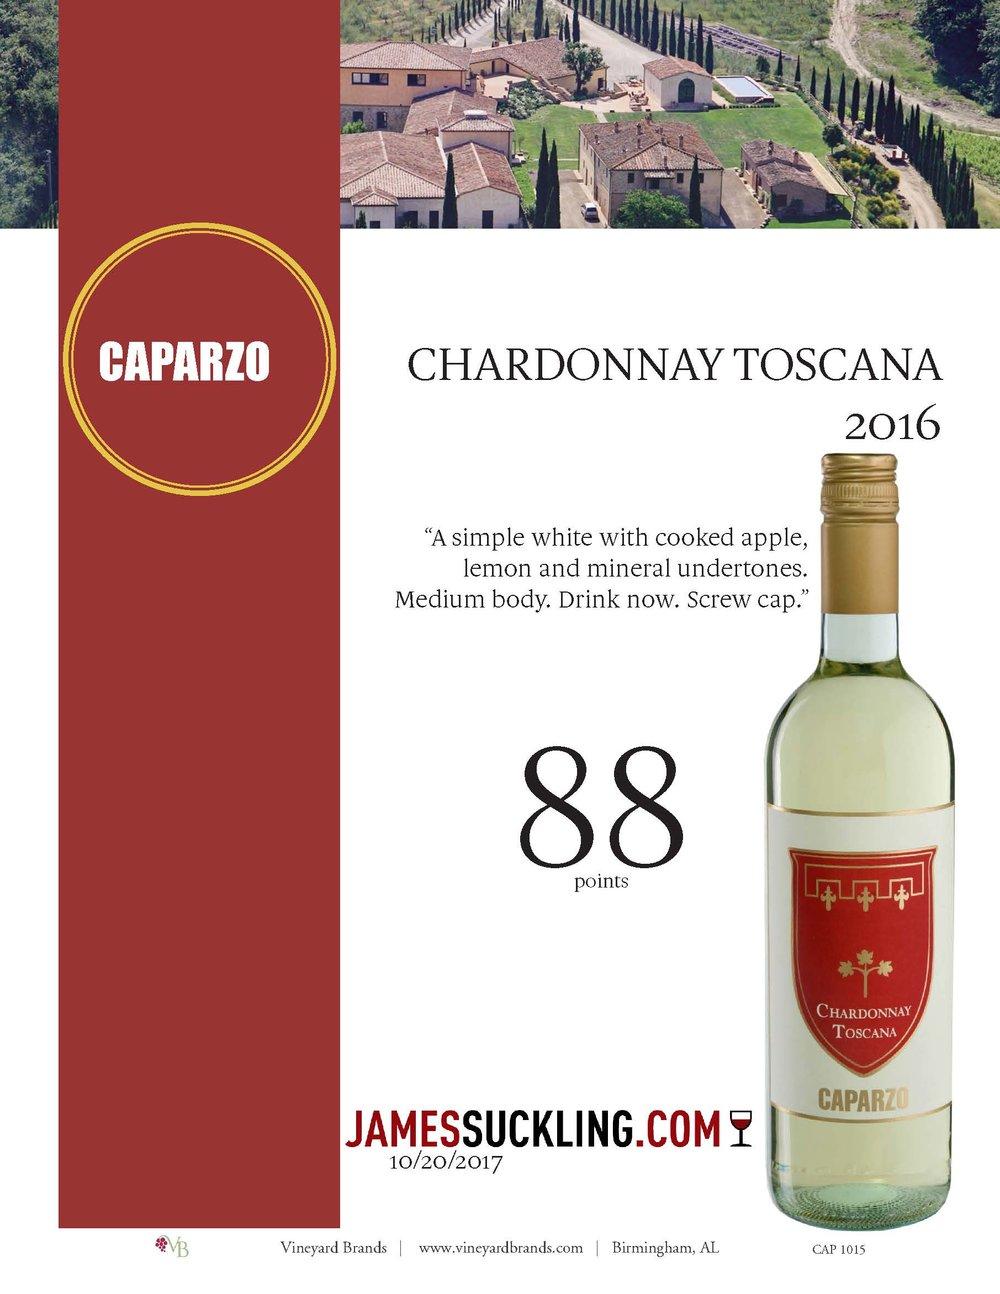 Caparzo Chardonnay Toscana 2016.jpg